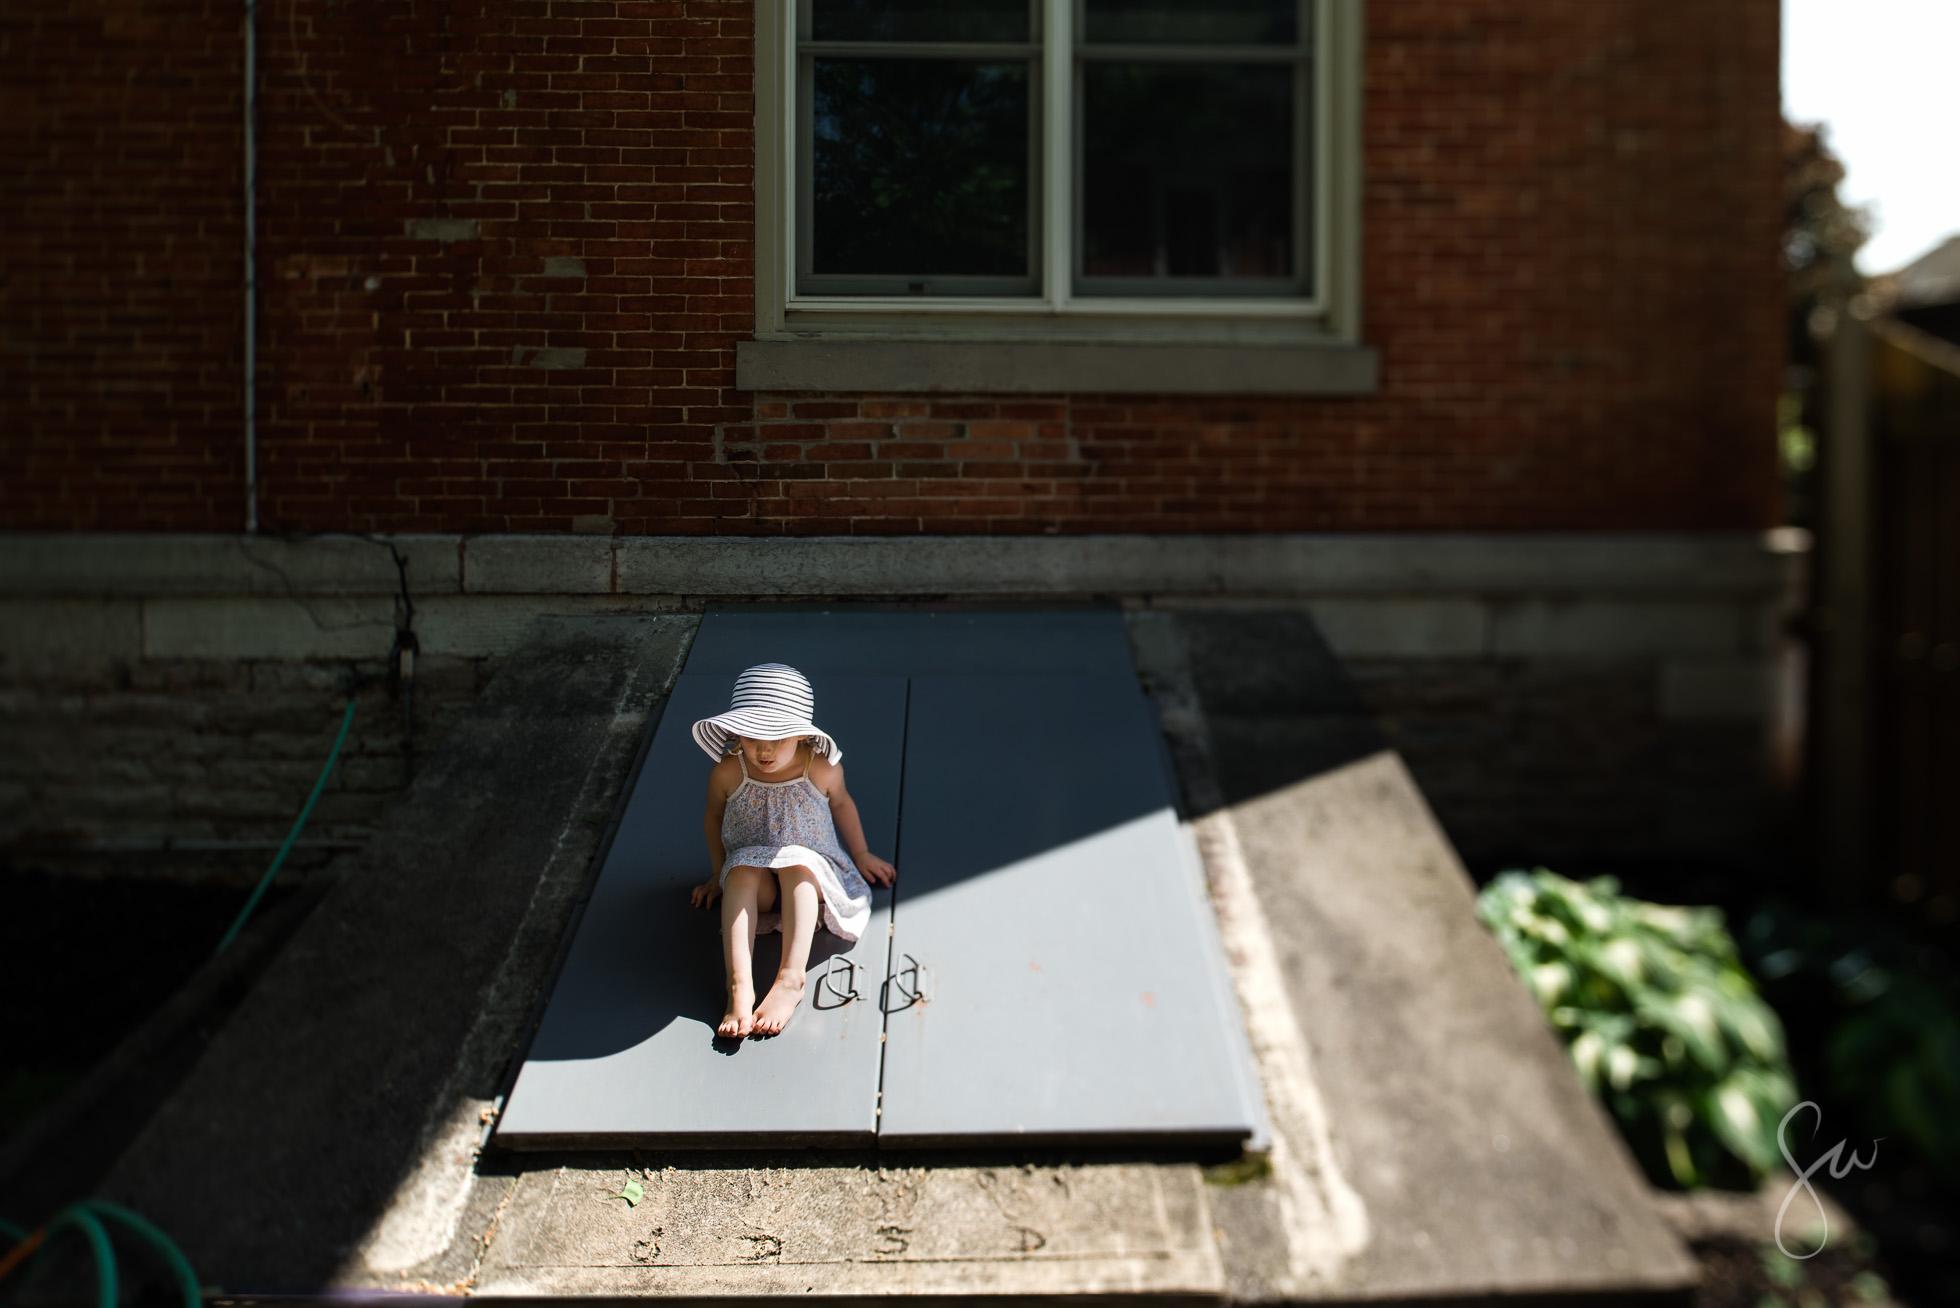 Nikon-24mm-Tilt-Shift-Environmental-Portrait-of-Girl-in-Sunhat-by-Sarah-Wilkerson-